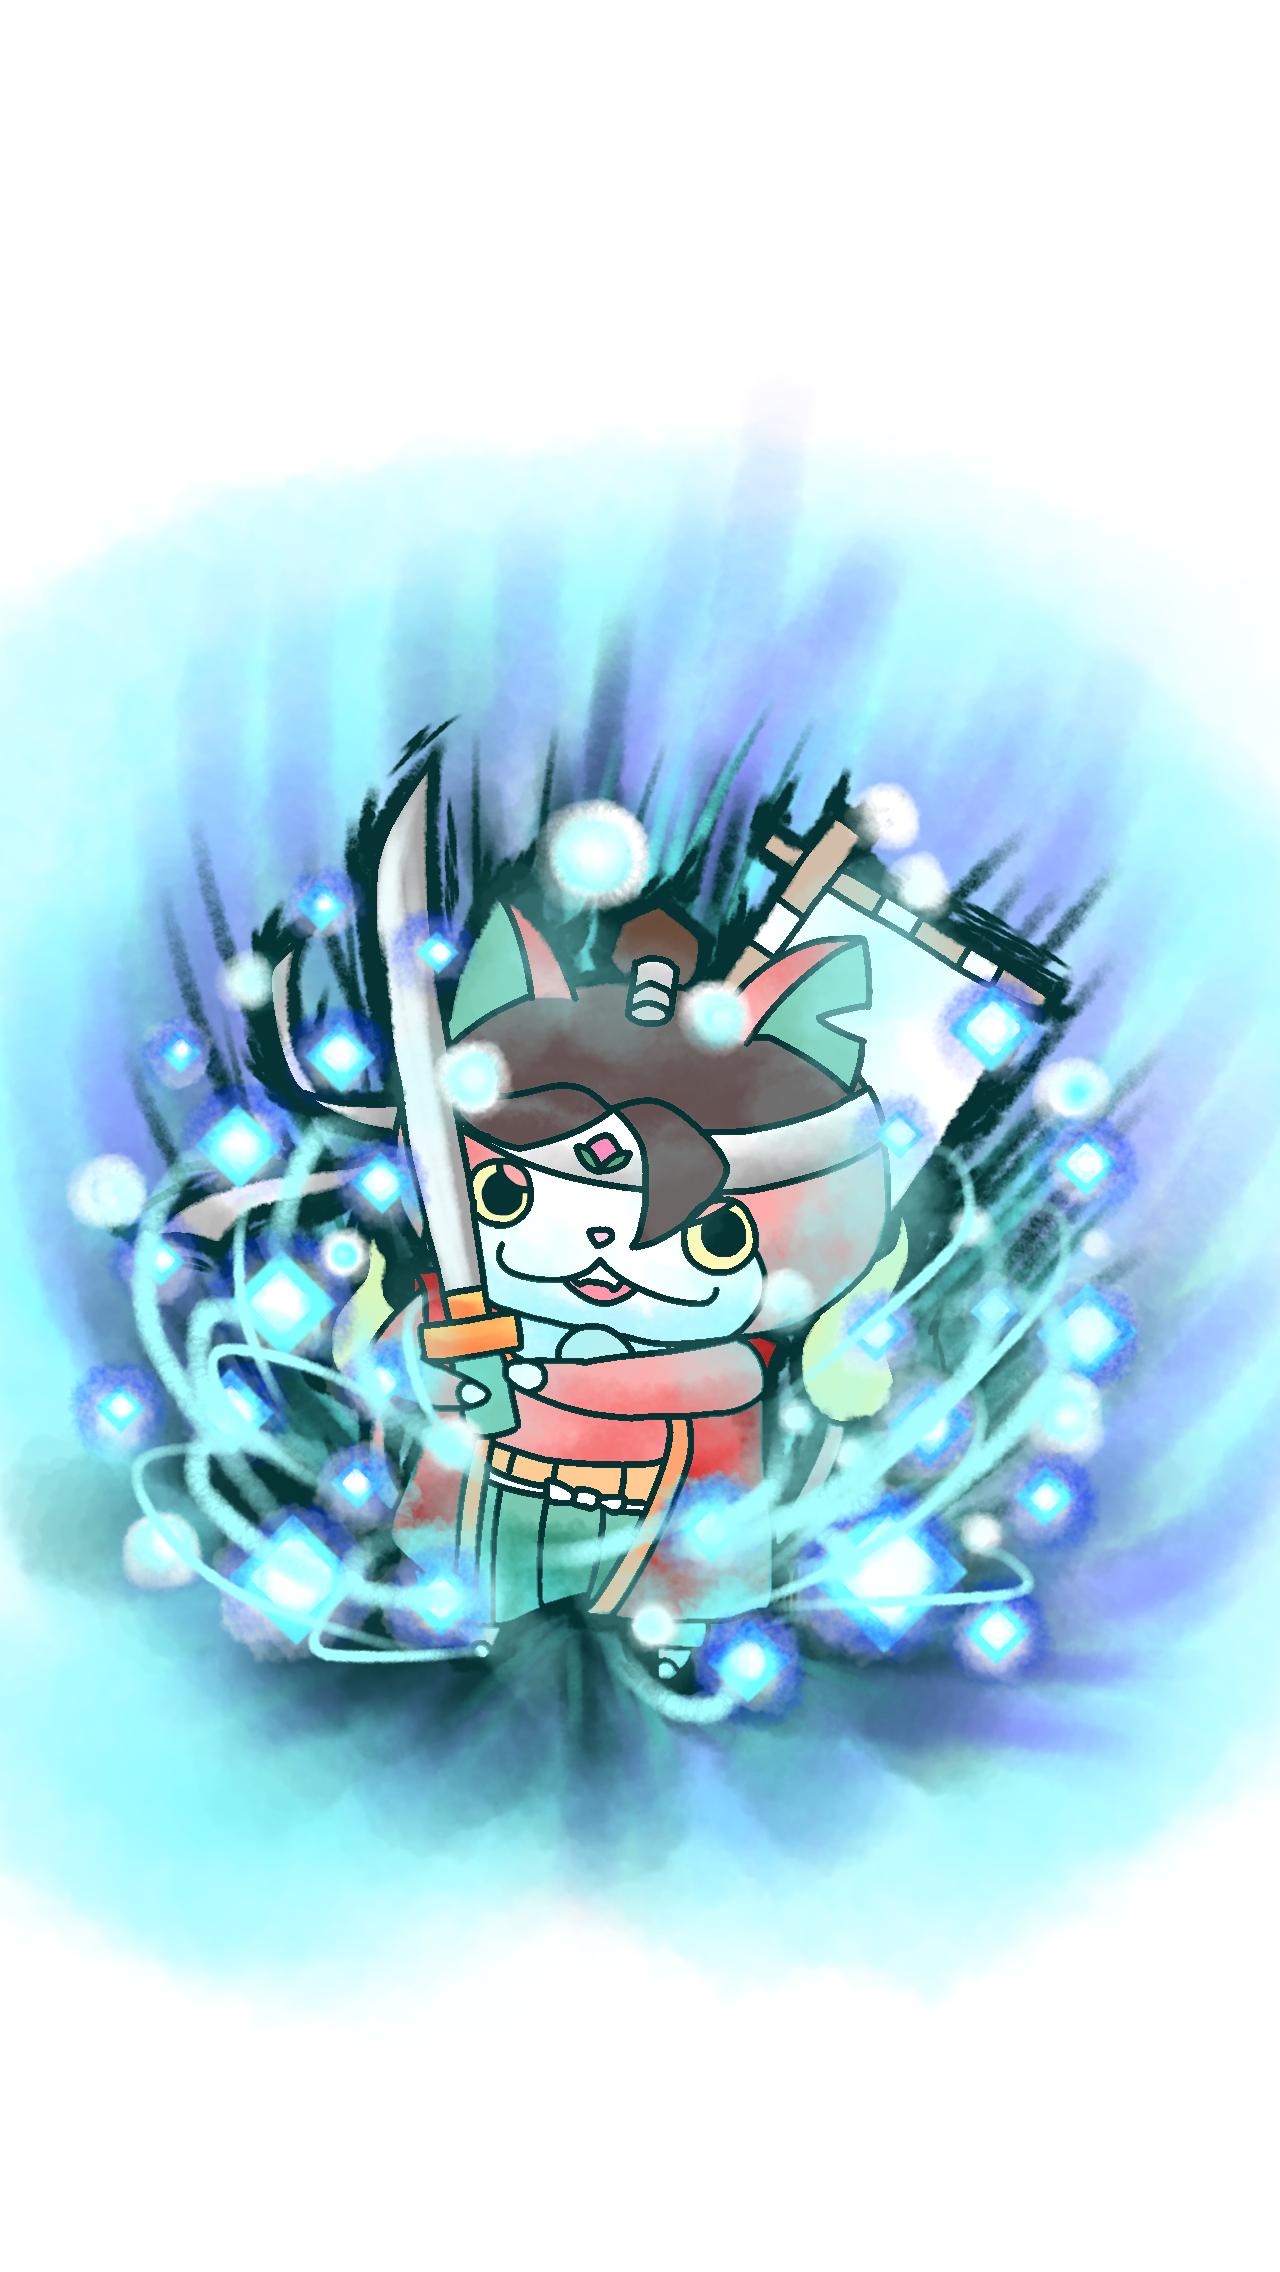 bメダル風モモタロニャン Ibispaint